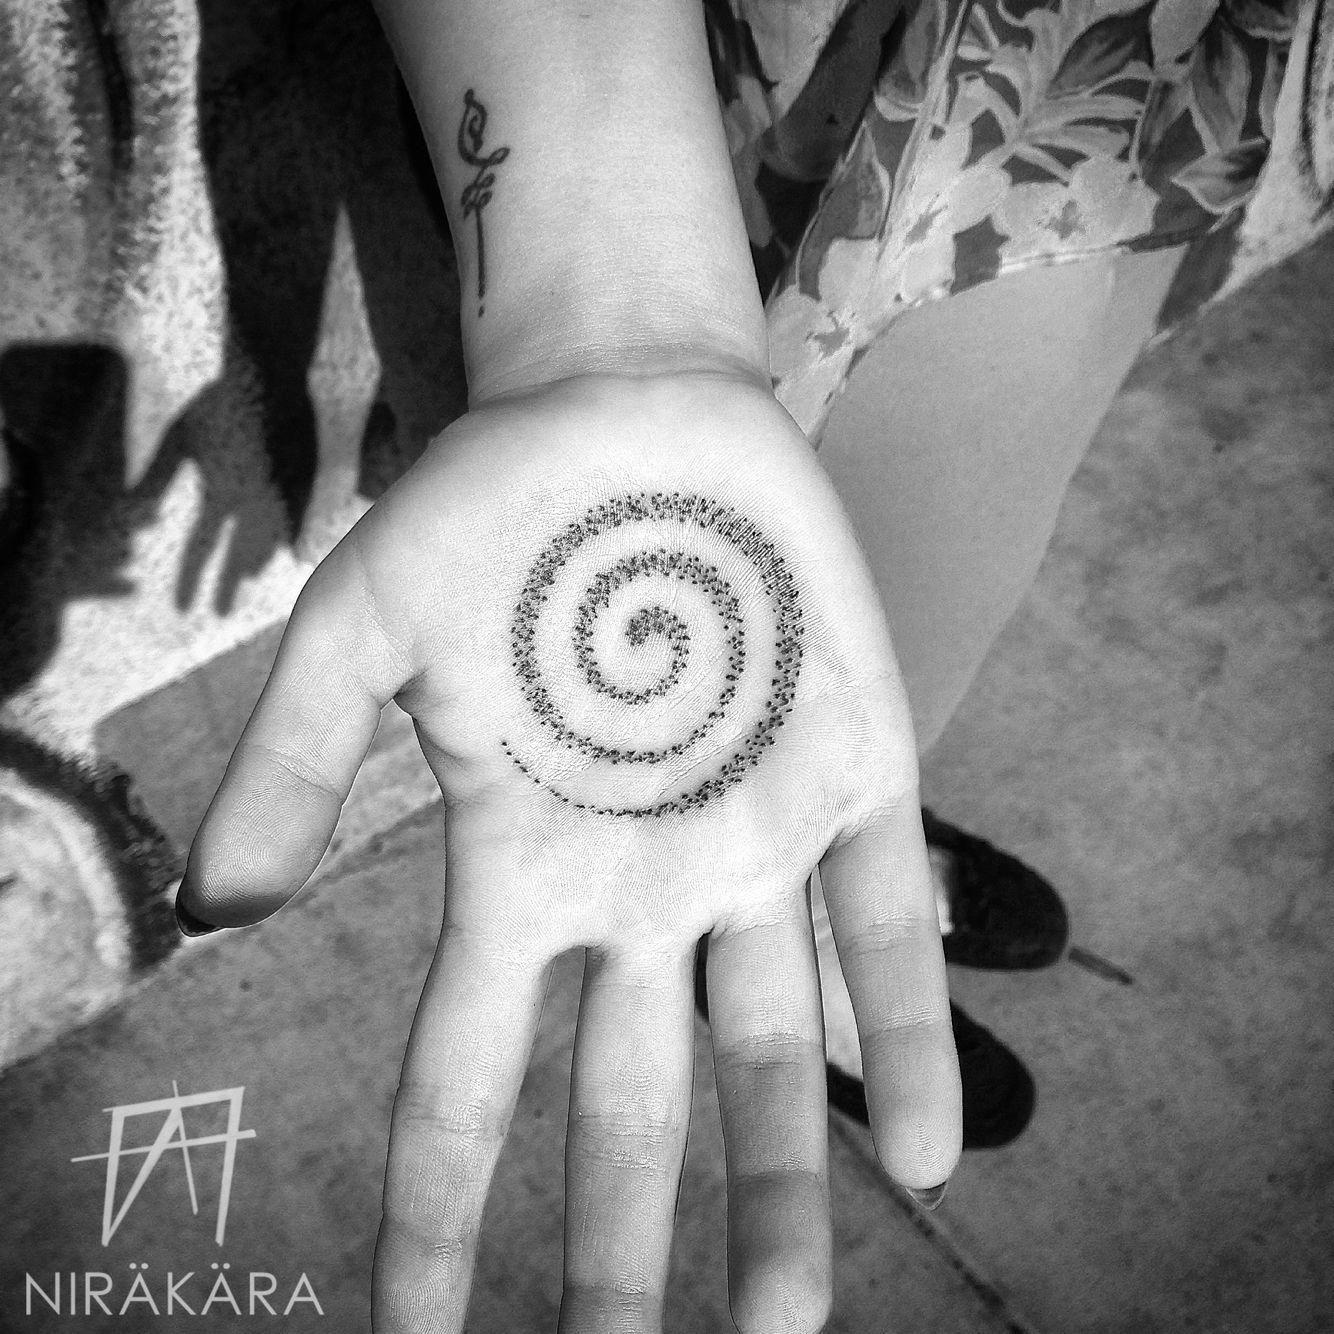 Blackwork Sacred Geometry Yoga Buddha Mandala Noir Meditation Dotwork Pointillism Stippling Tatt Hand Palm Tattoos Hand Tattoos Hand Tattoos Pictures